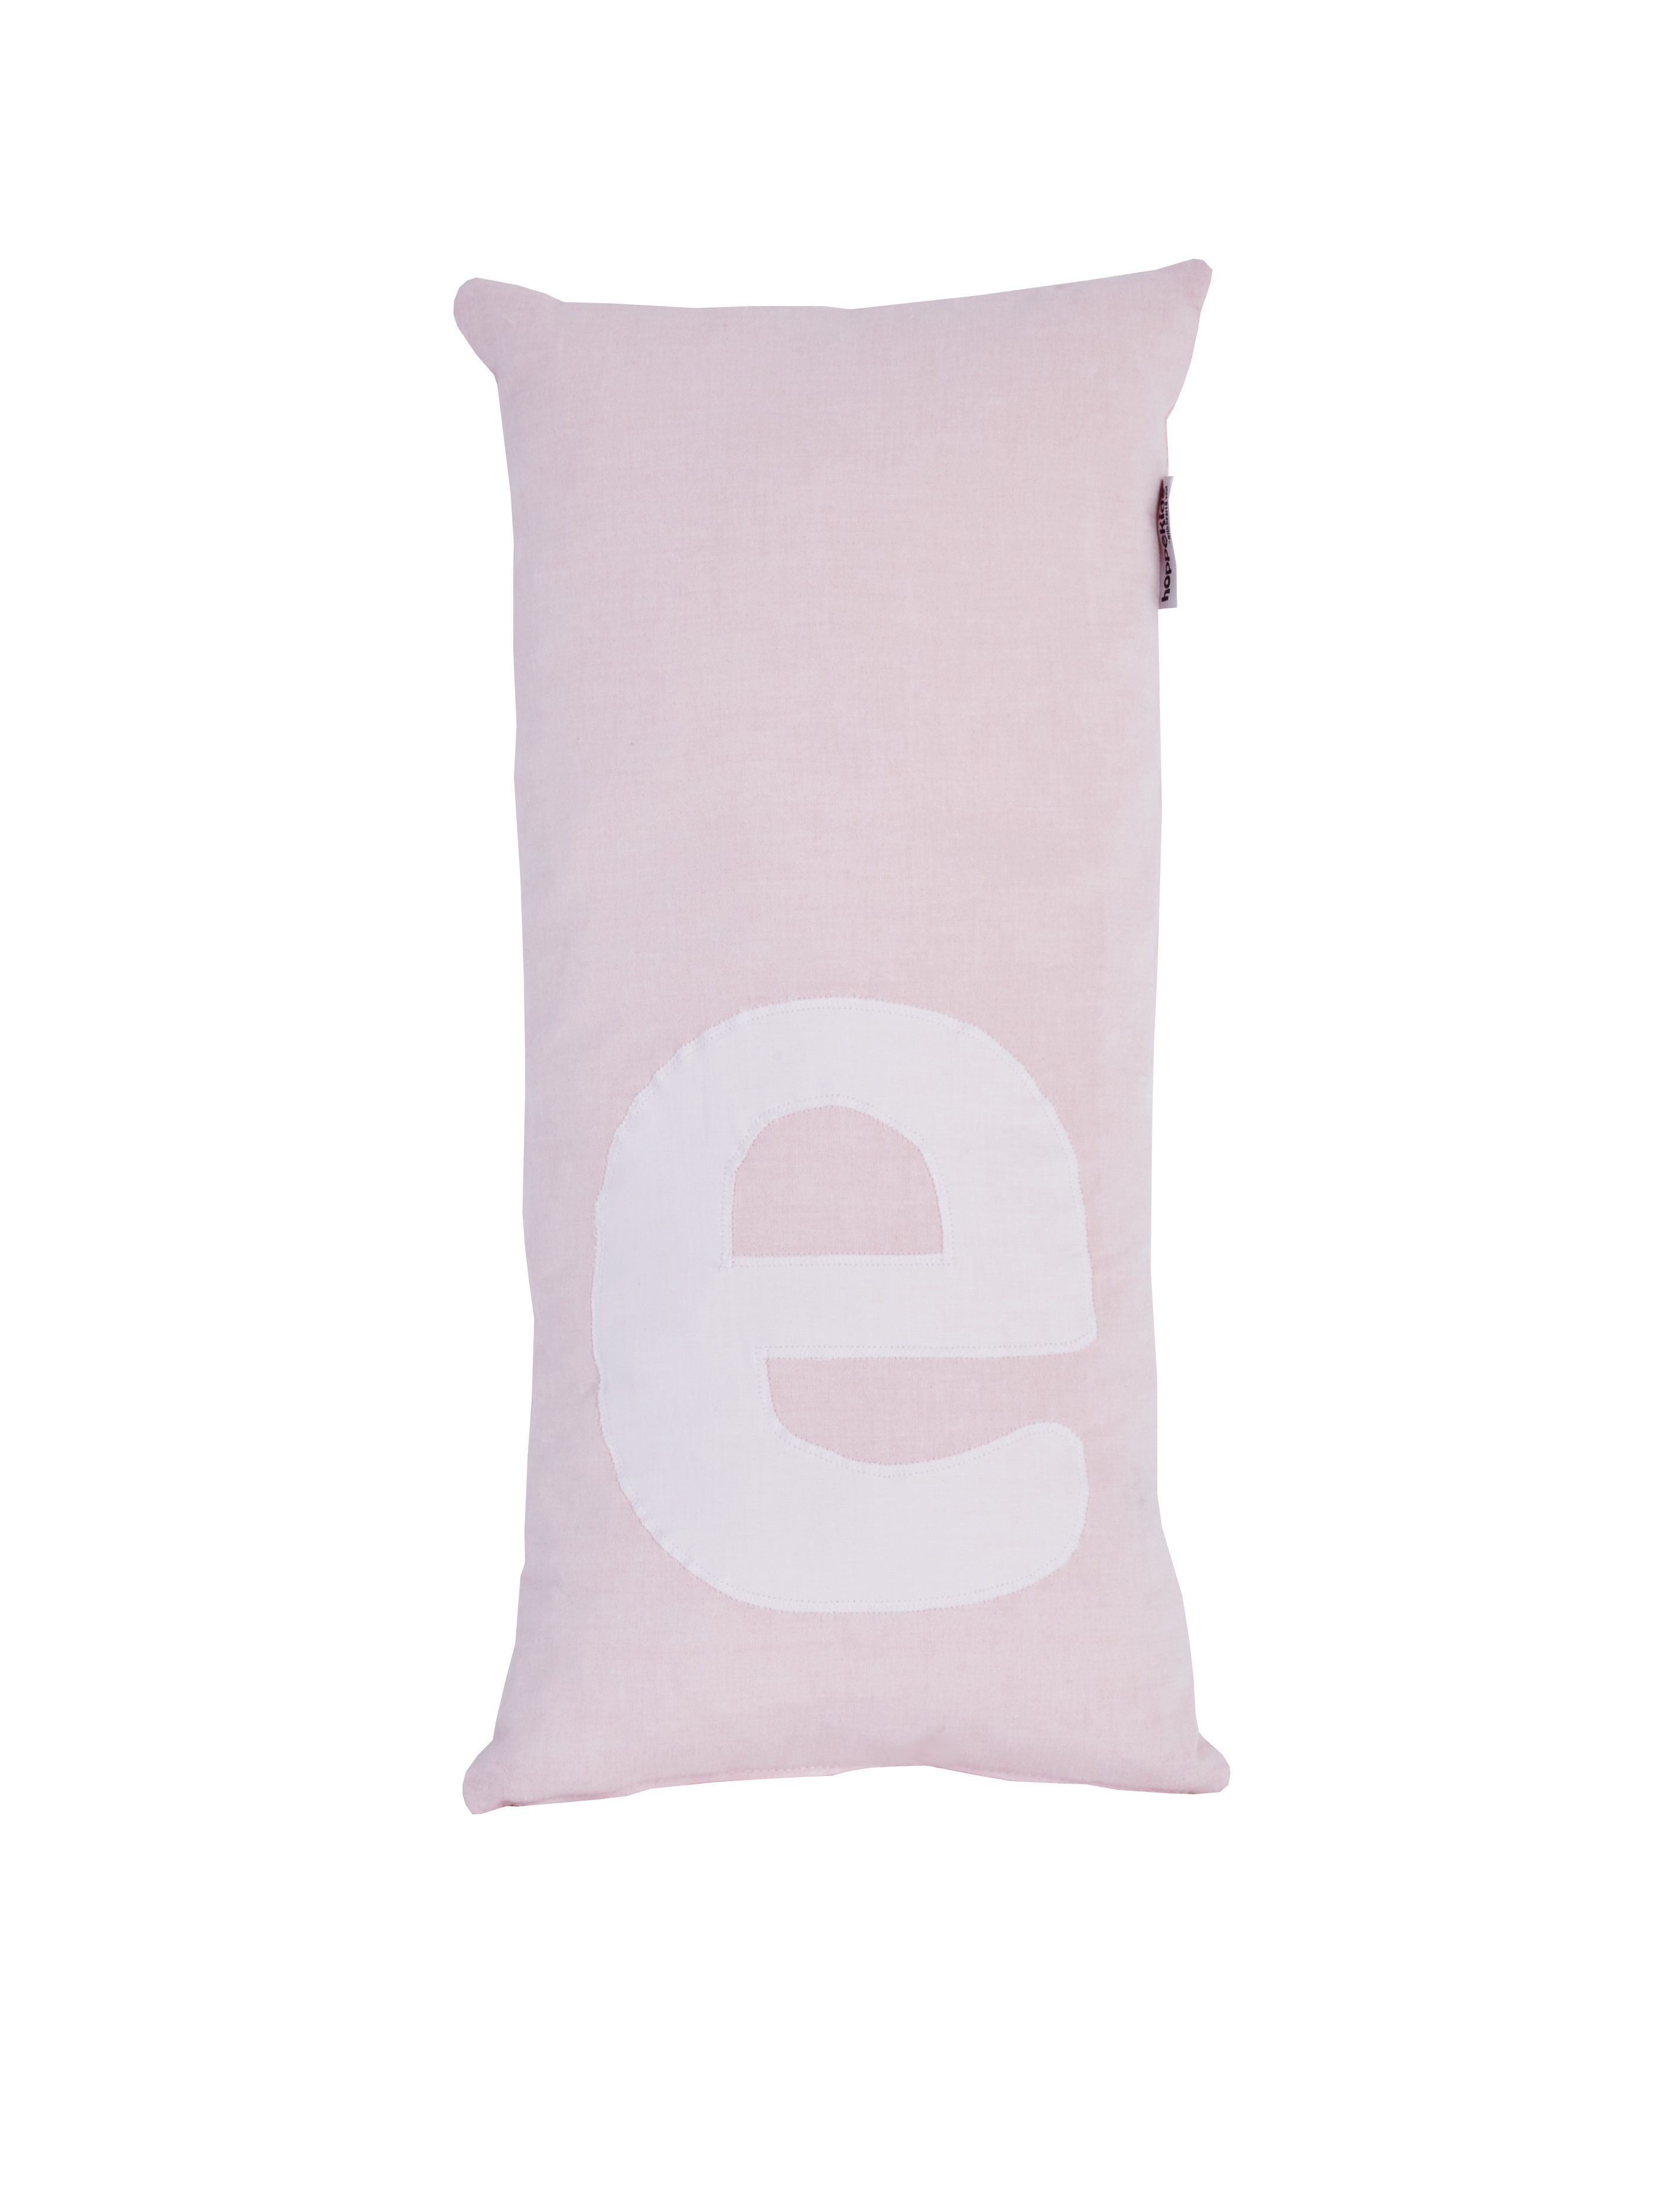 Image of   Pude Alphabet e lyserød fra Hoppekids